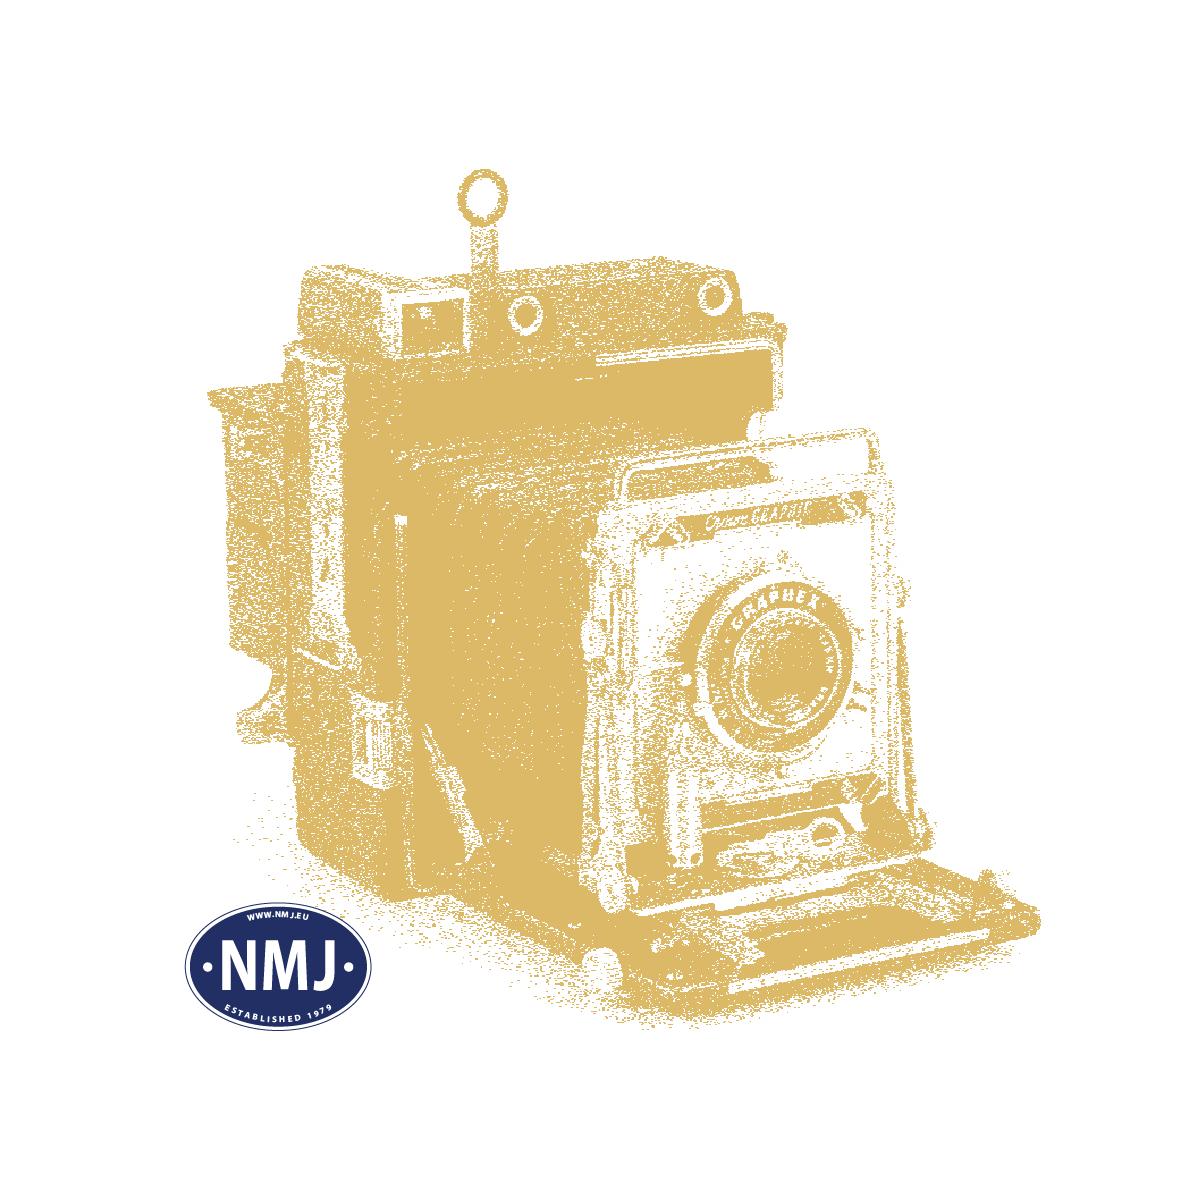 NMJT203.101 - NMJ Topline SJ AB3.4949, 1/2 Cl. Passenger coach, white SJ logo